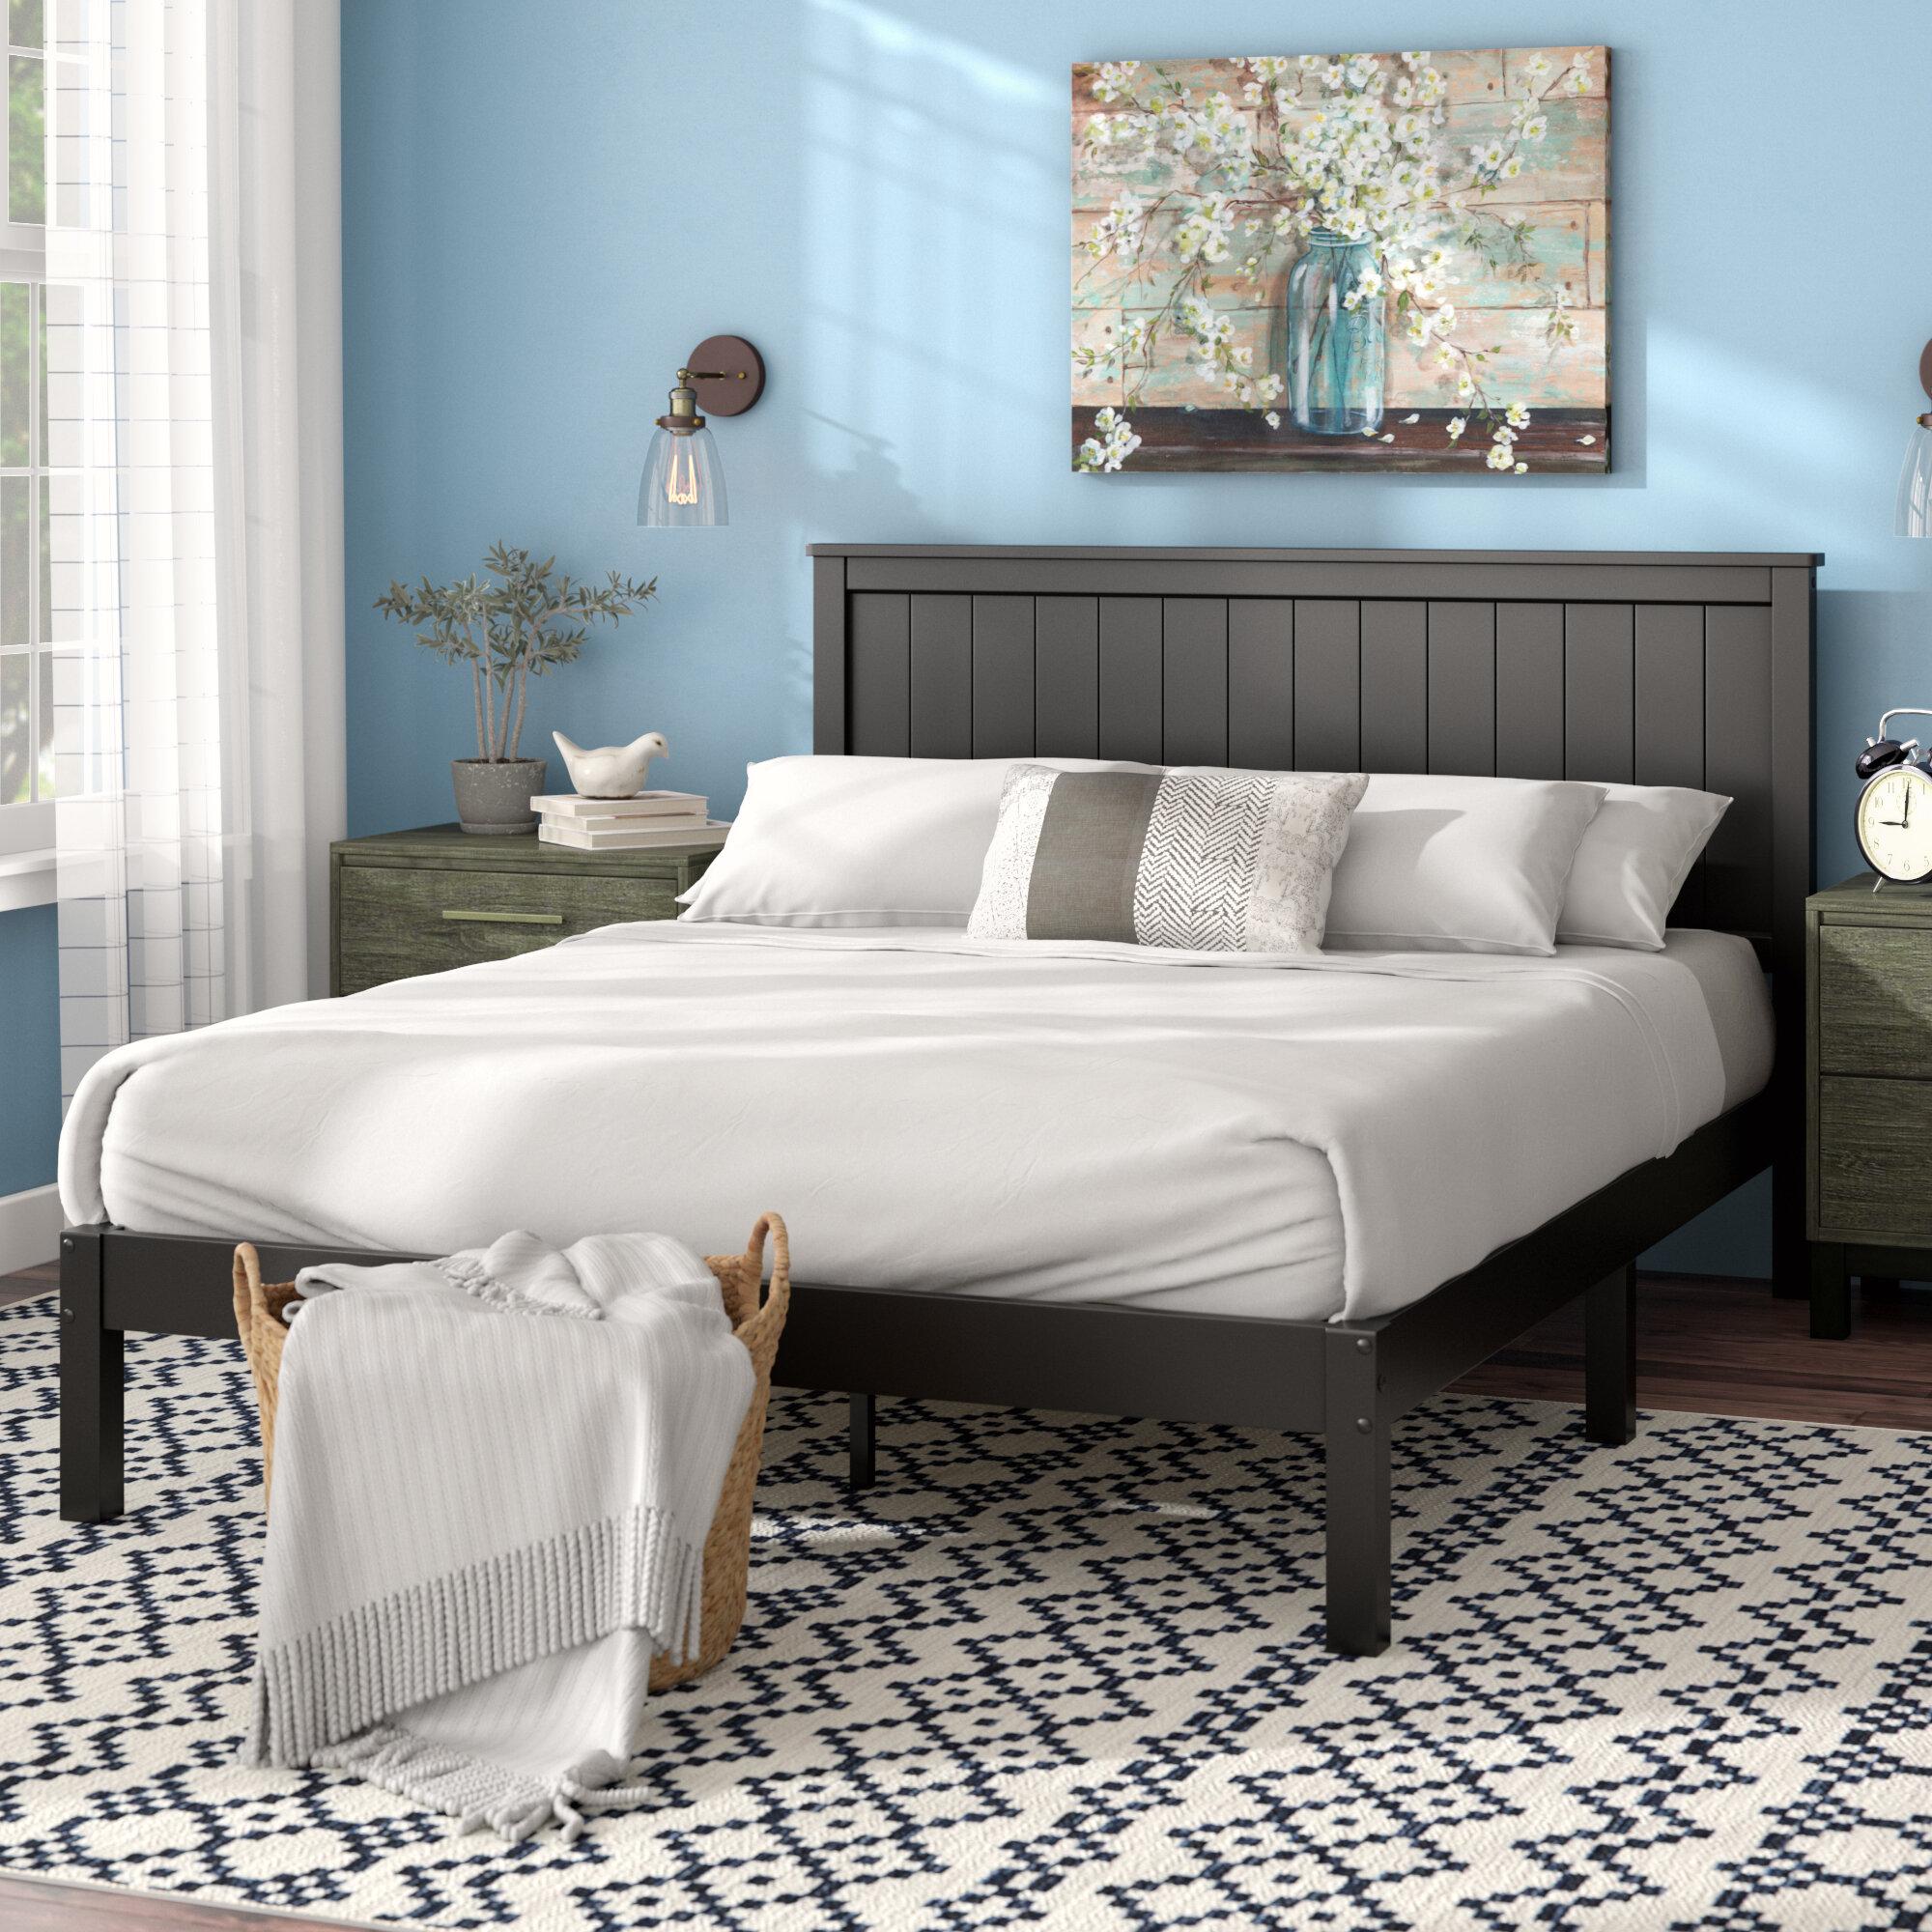 Black Wood Beds Frames You Ll Love In 2021 Wayfair